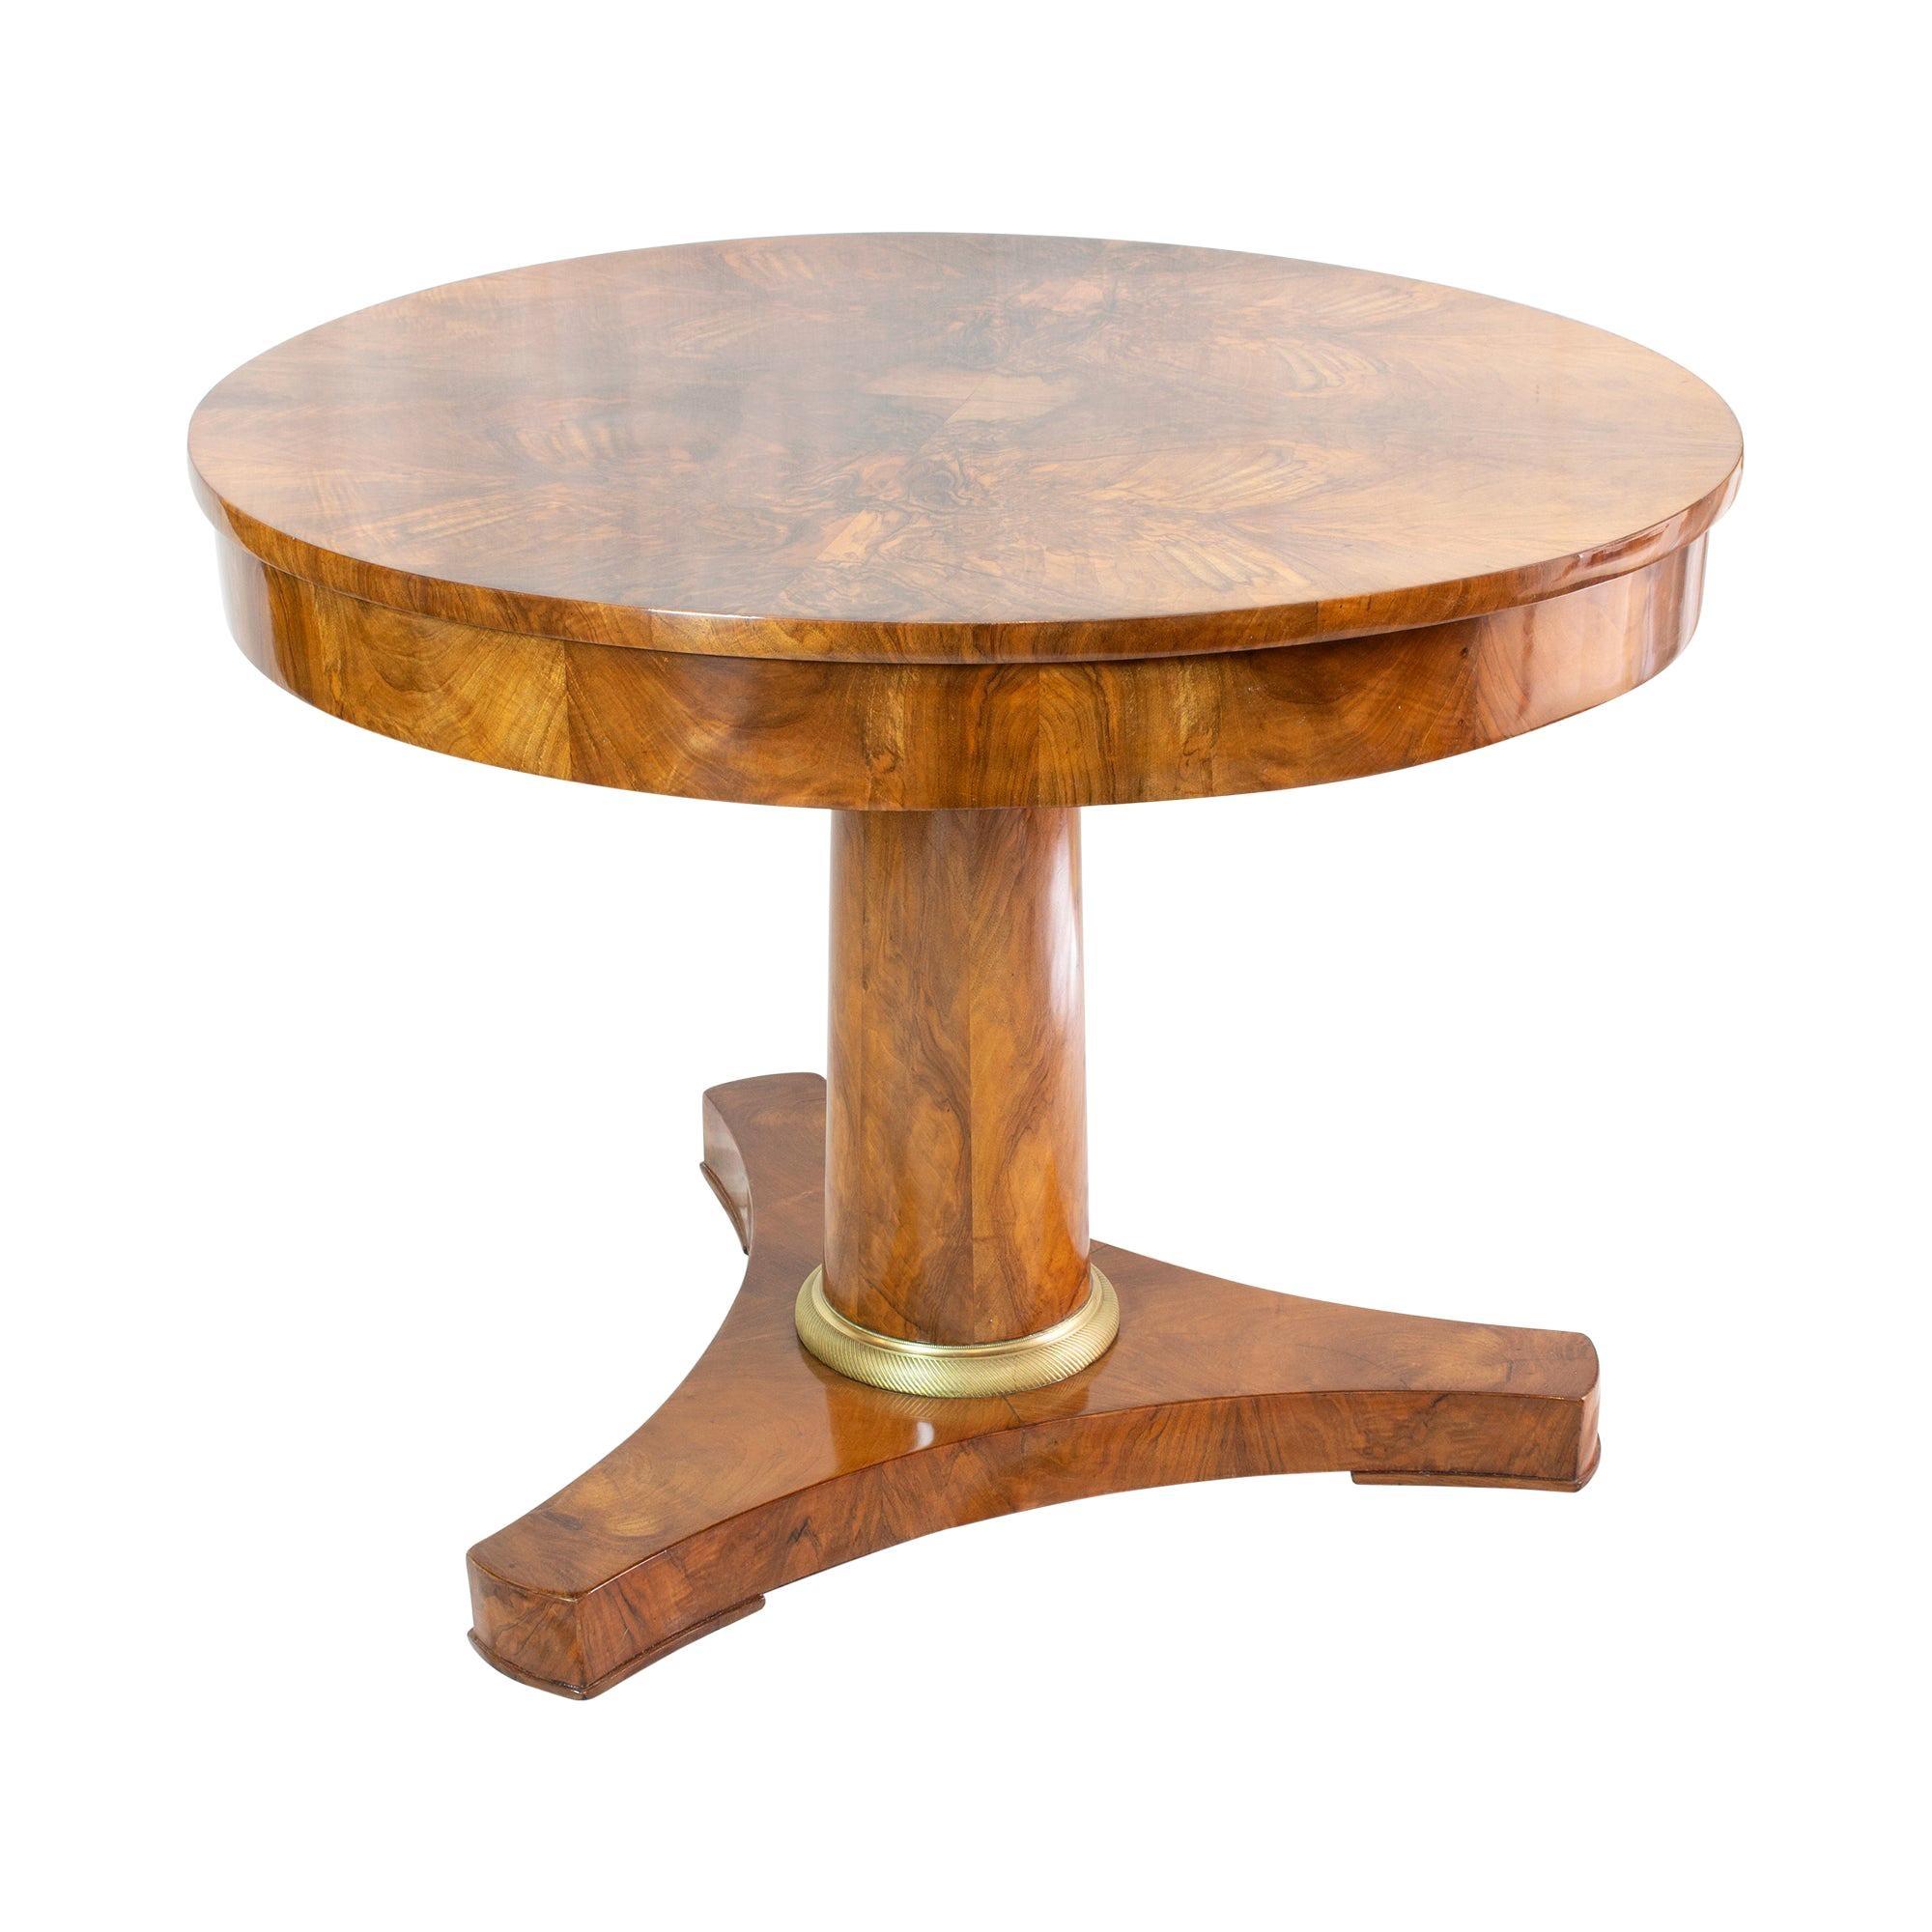 19th Century Biedermeier / Empire Round Salon Walnut Table